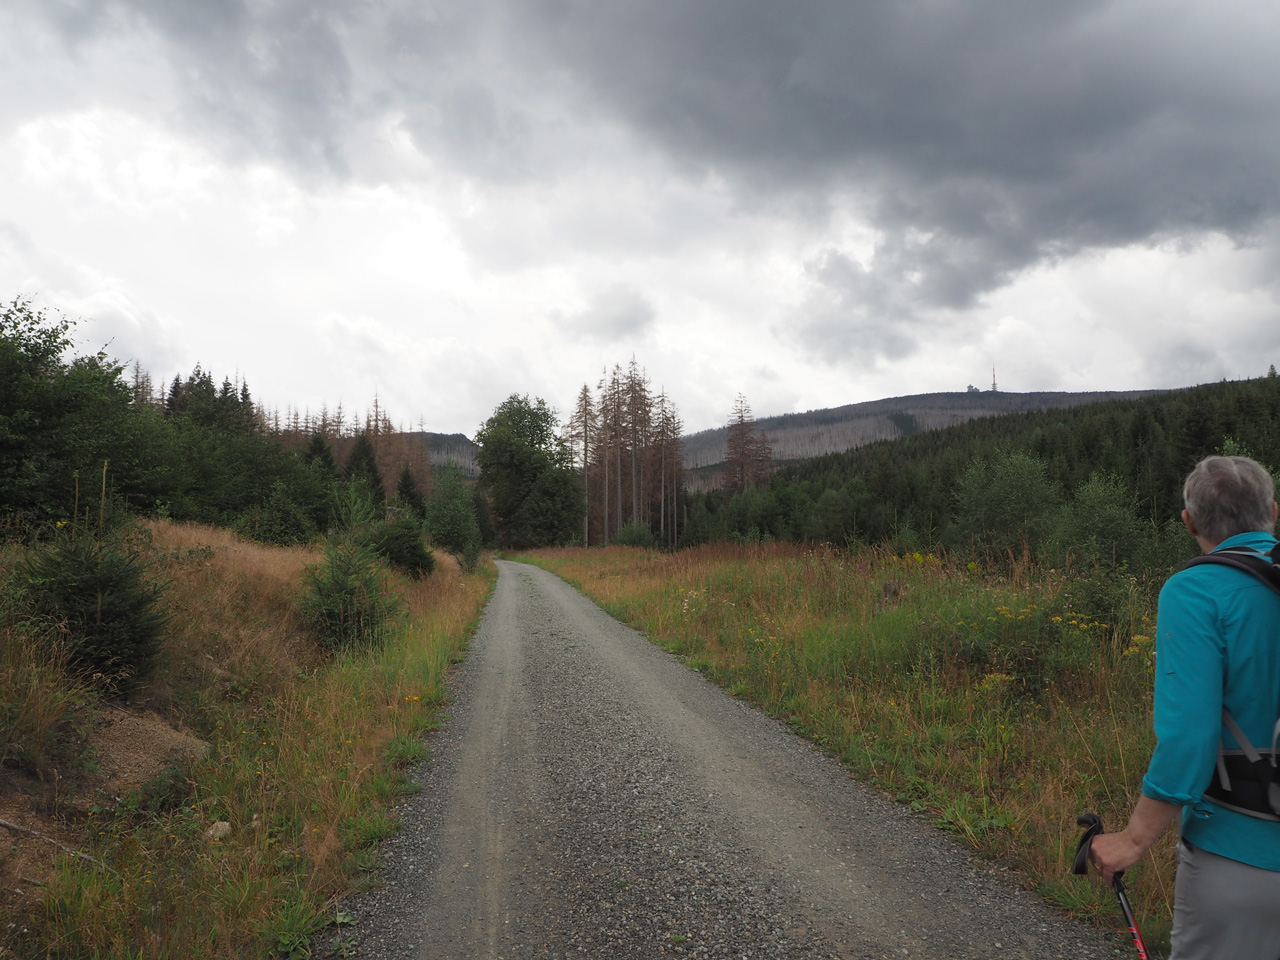 donkere wolken rond de Brocken